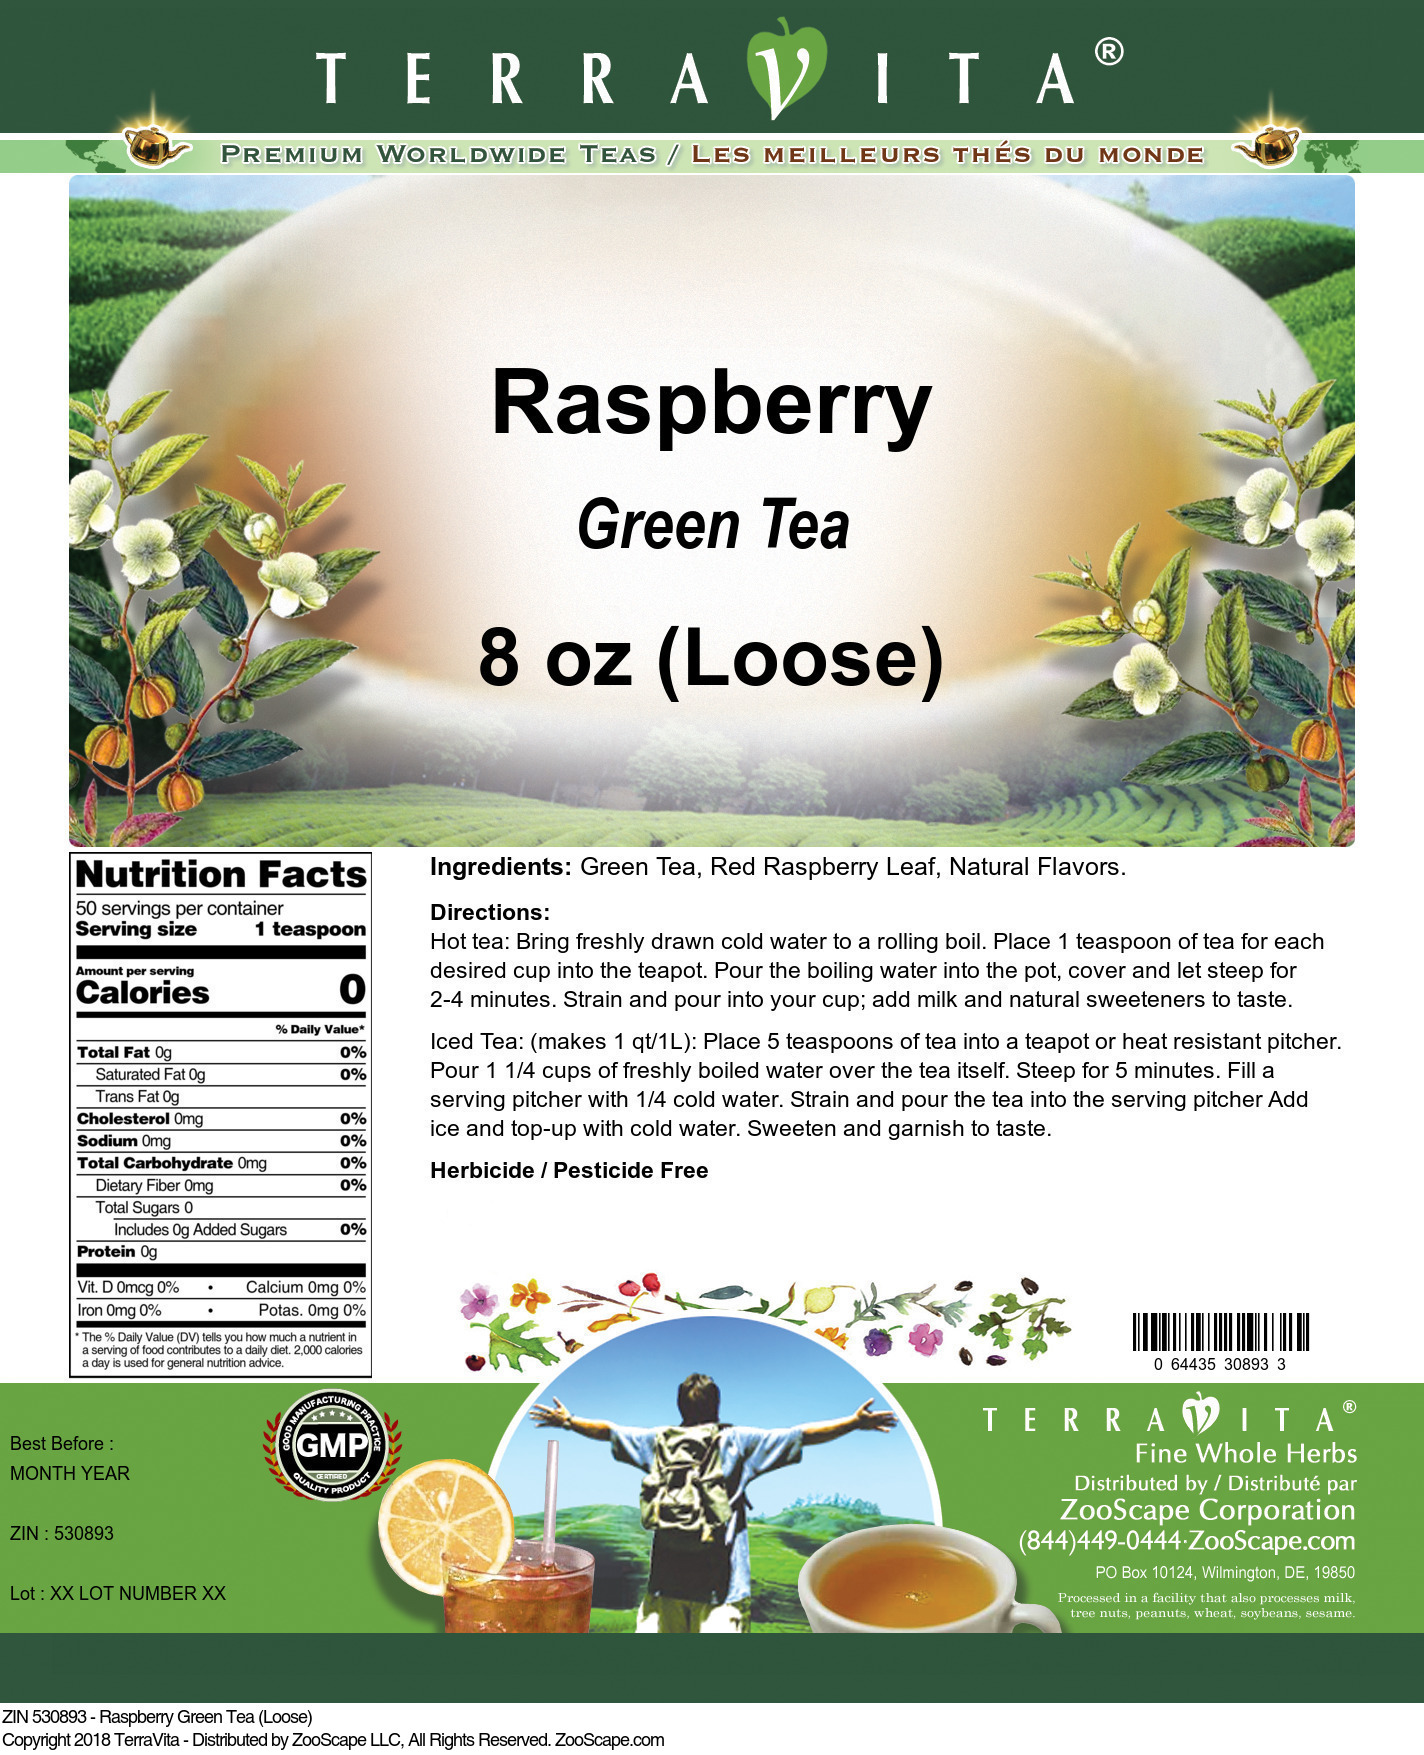 Raspberry Green Tea (Loose)